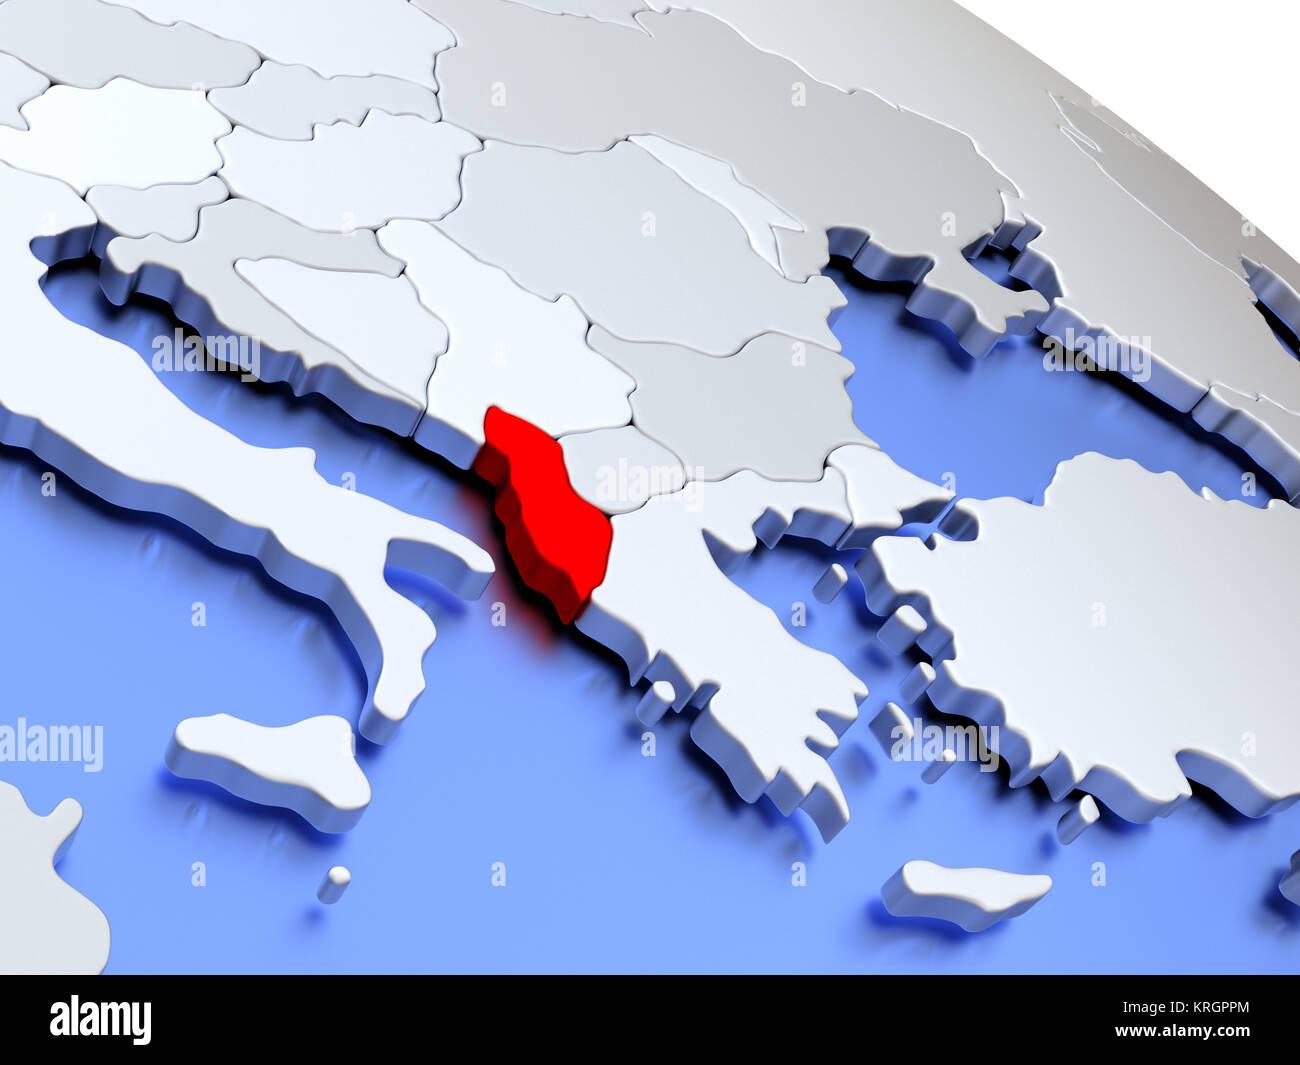 Albania On World Map Stock Photo 169399516 Alamy